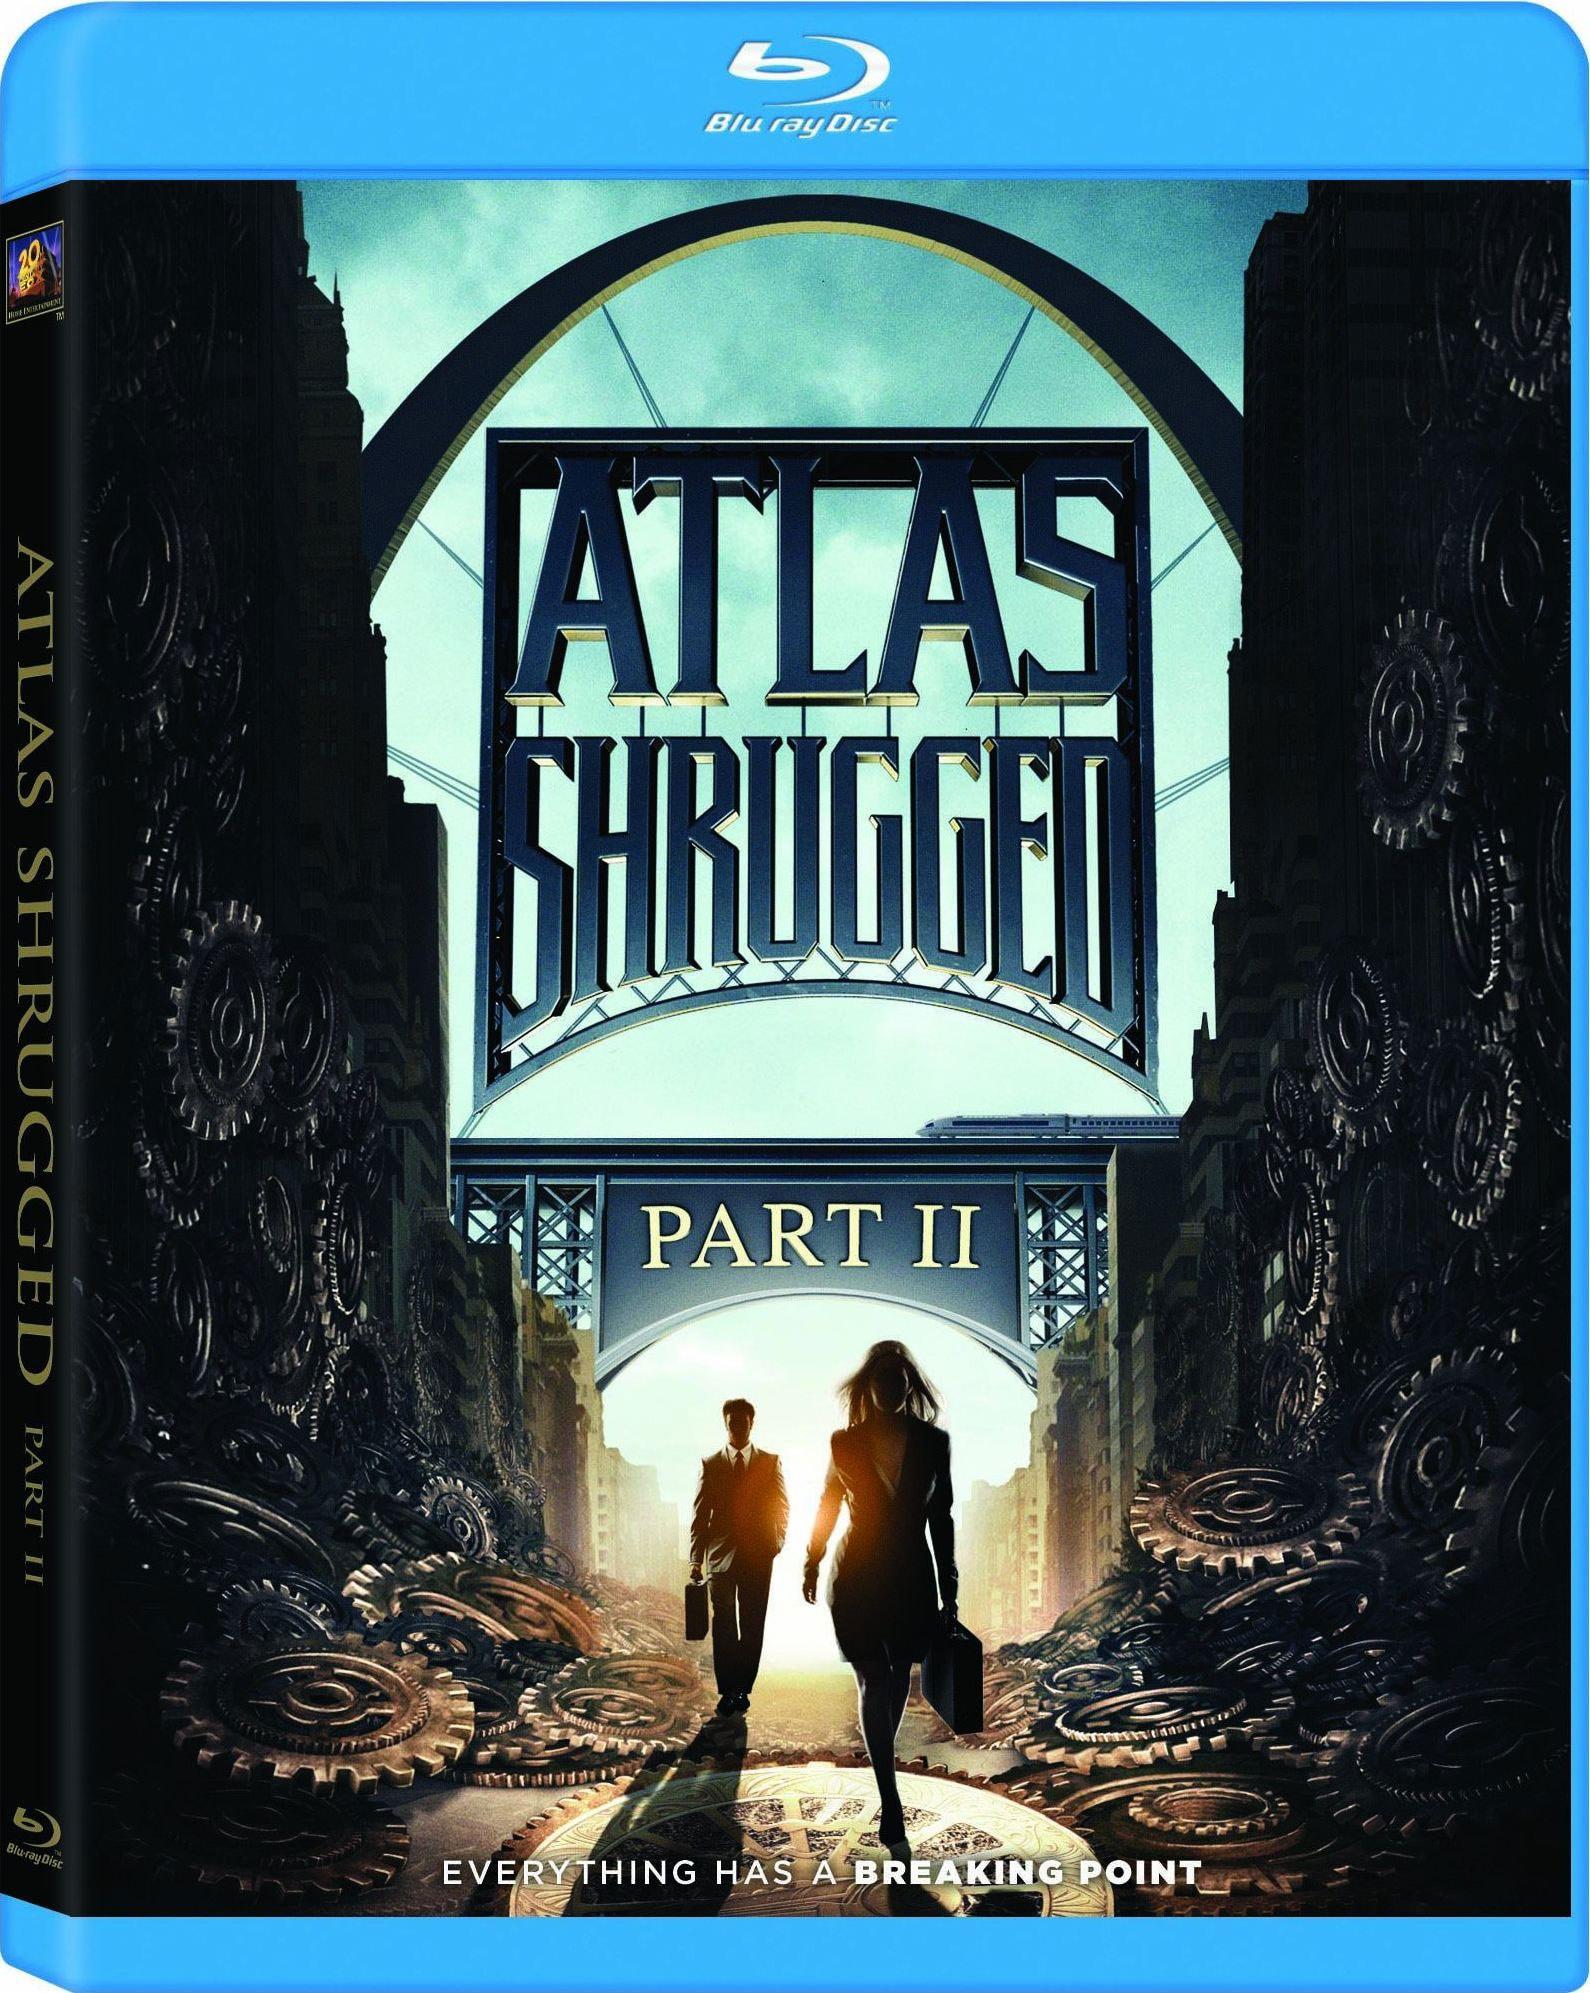 Atlas Shrugged Part II (Blu-ray Disc)